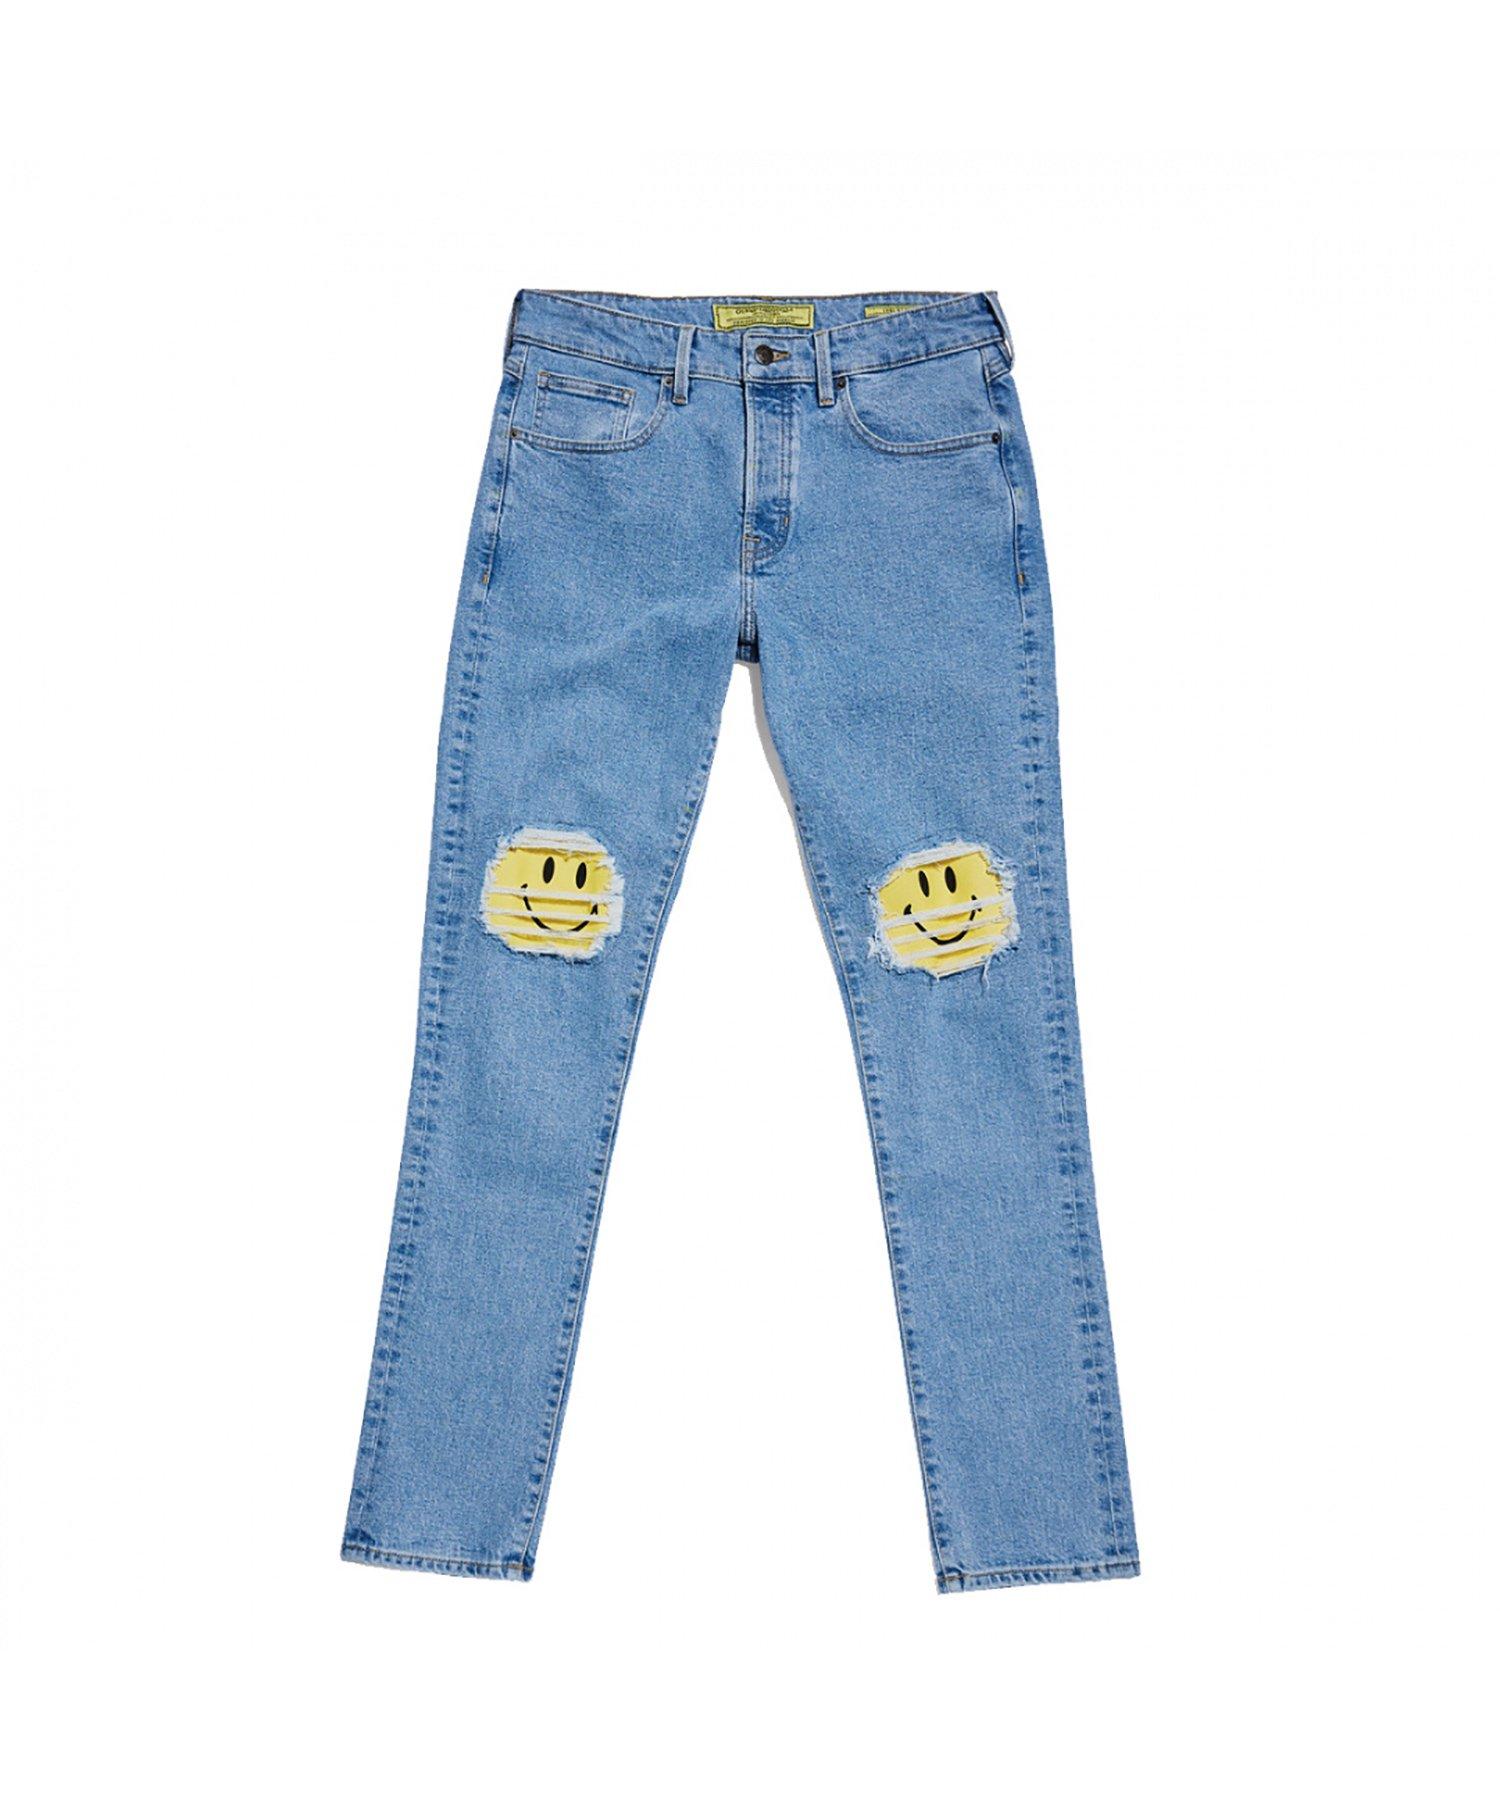 GUESS × CHINATOWN MARKET × Smiley Indigo Slim Jeans